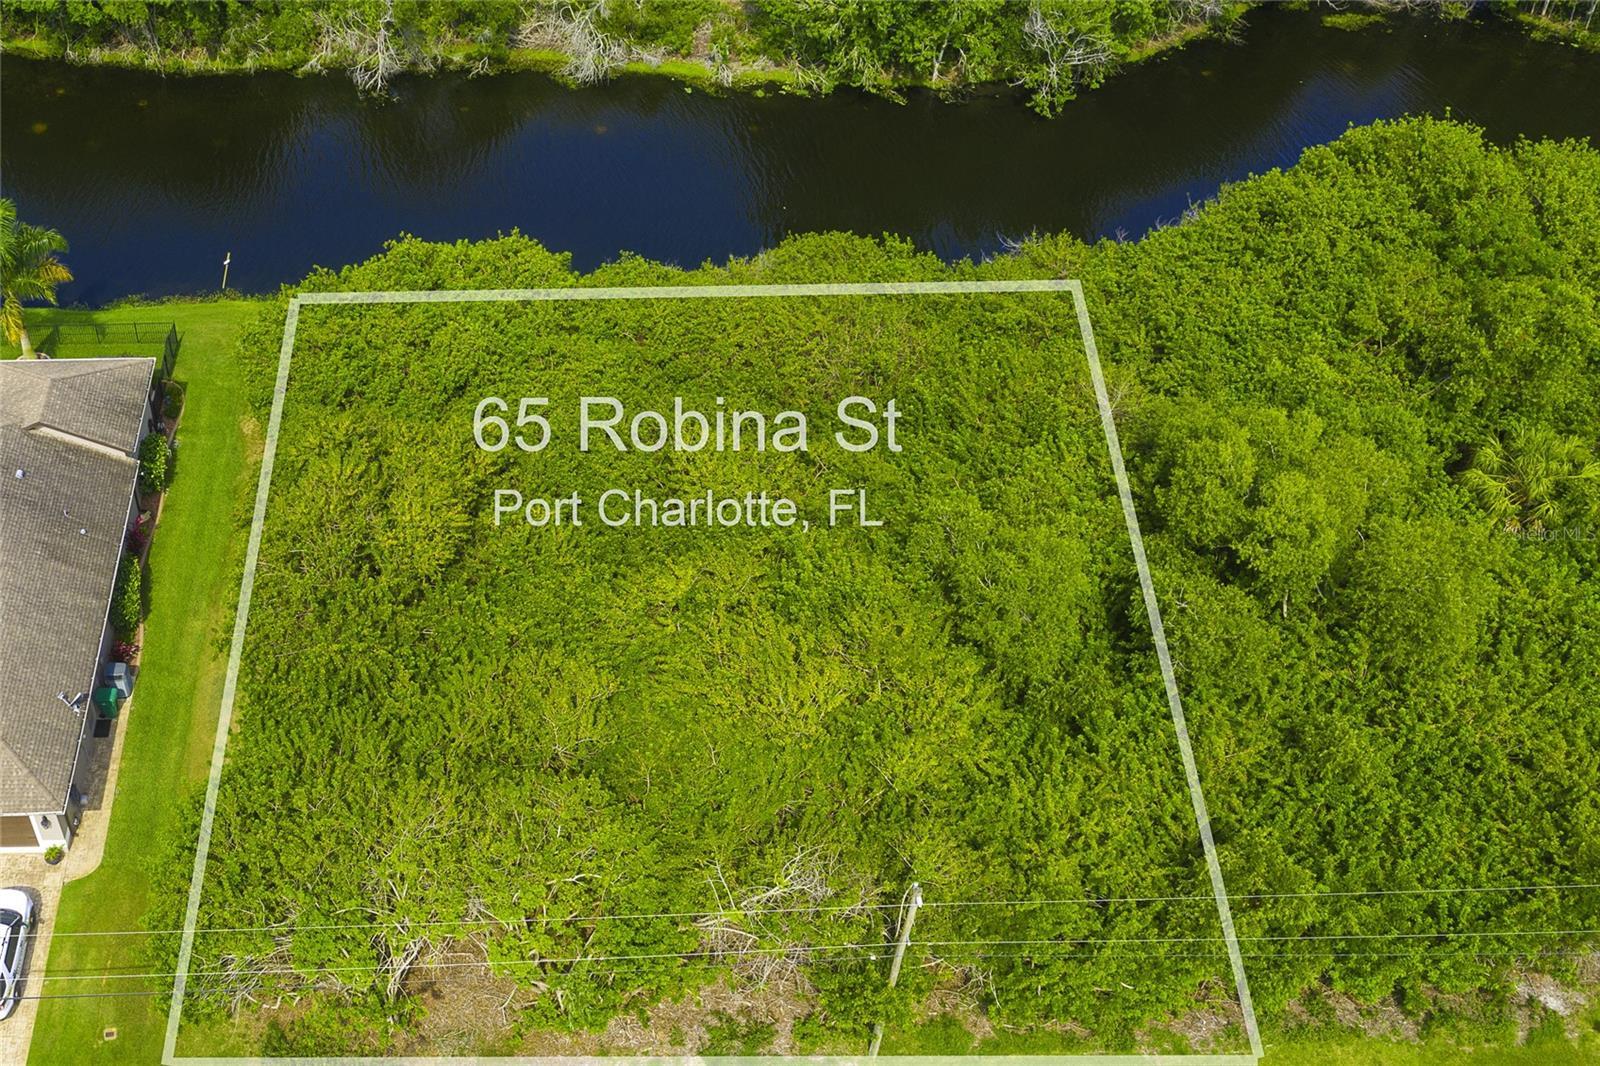 65 Robina St